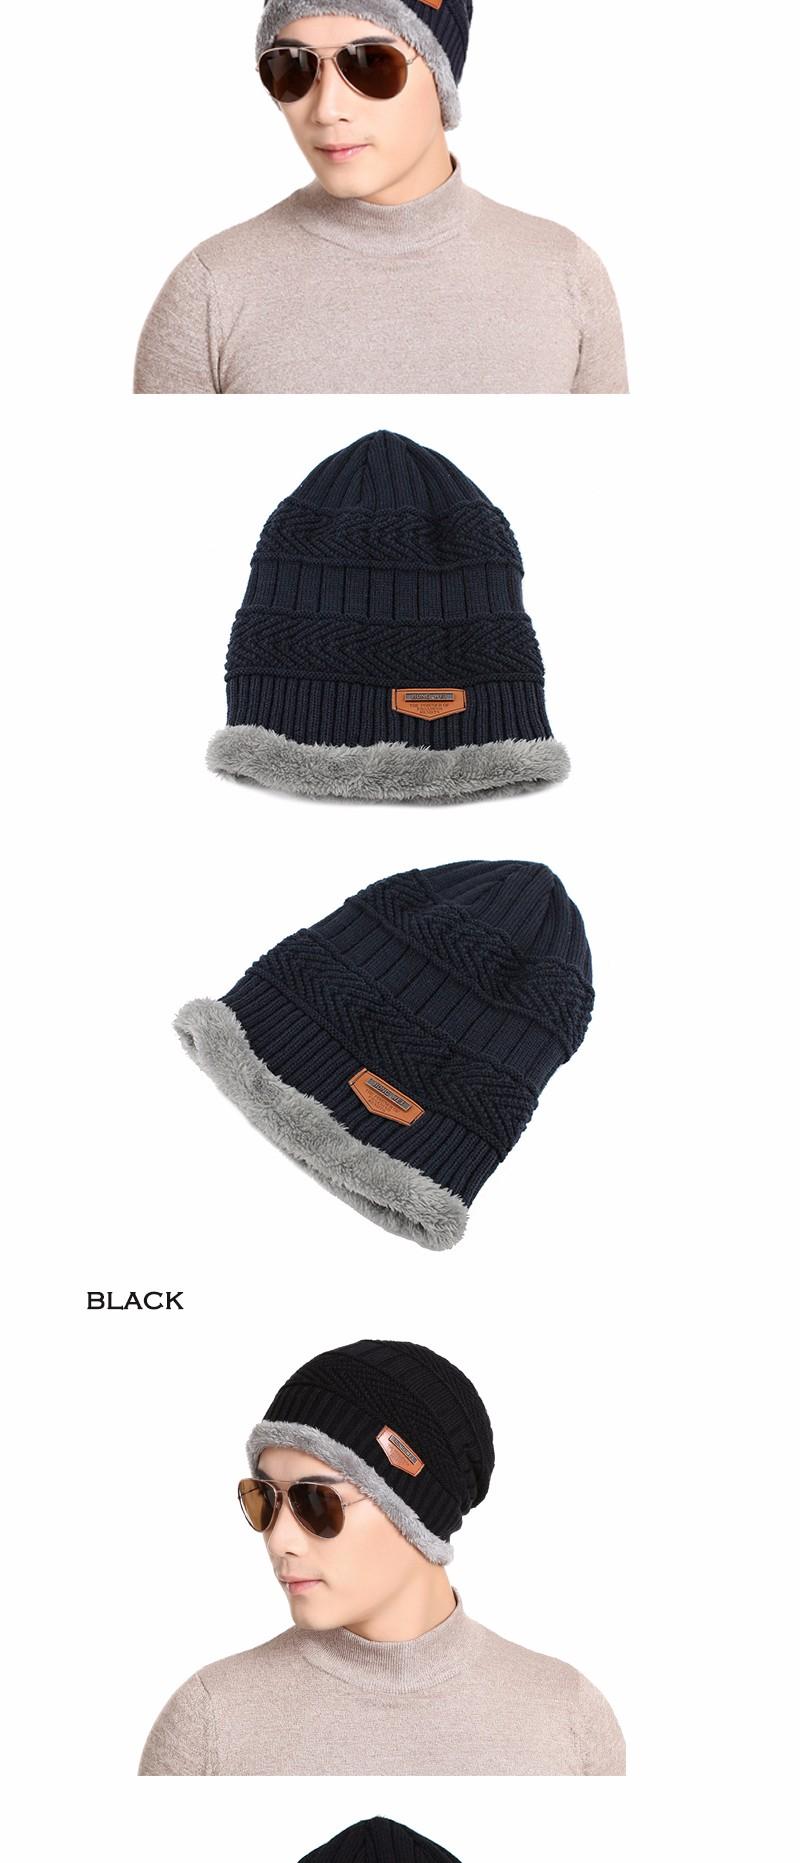 FETSBUY Pure Color Winter Skullies Beanies Hat Knit Winter Hat For Man Warm Hat Velvet Cap Bonnet Toucas Inverno Knitted Hats 15